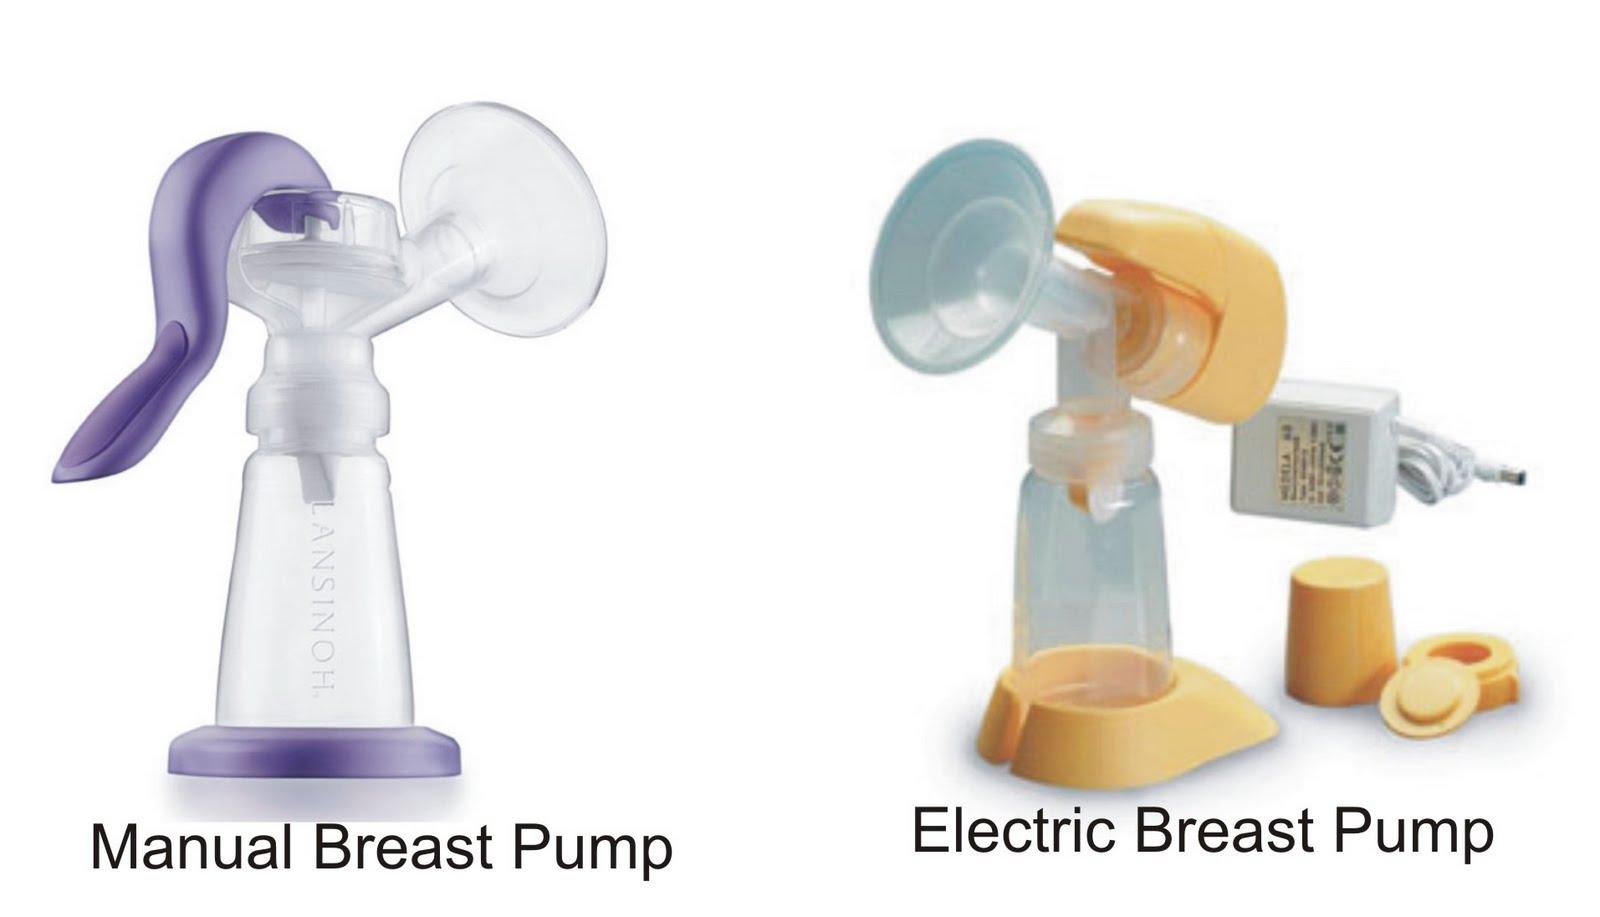 Manual breast pump vs electric